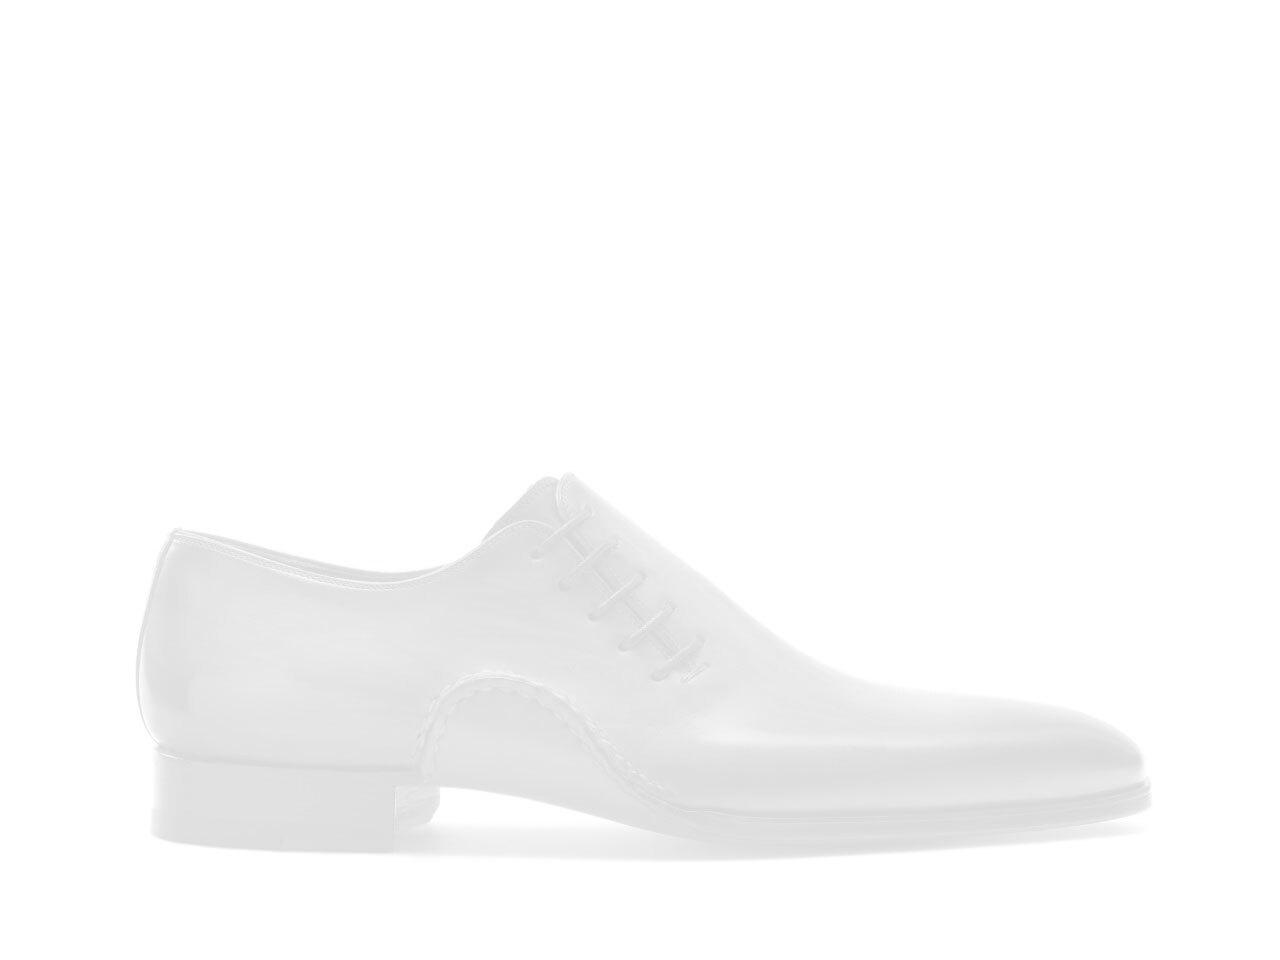 Pair of the Magnanni Frades Grafito Men's Single Monk Strap Shoes